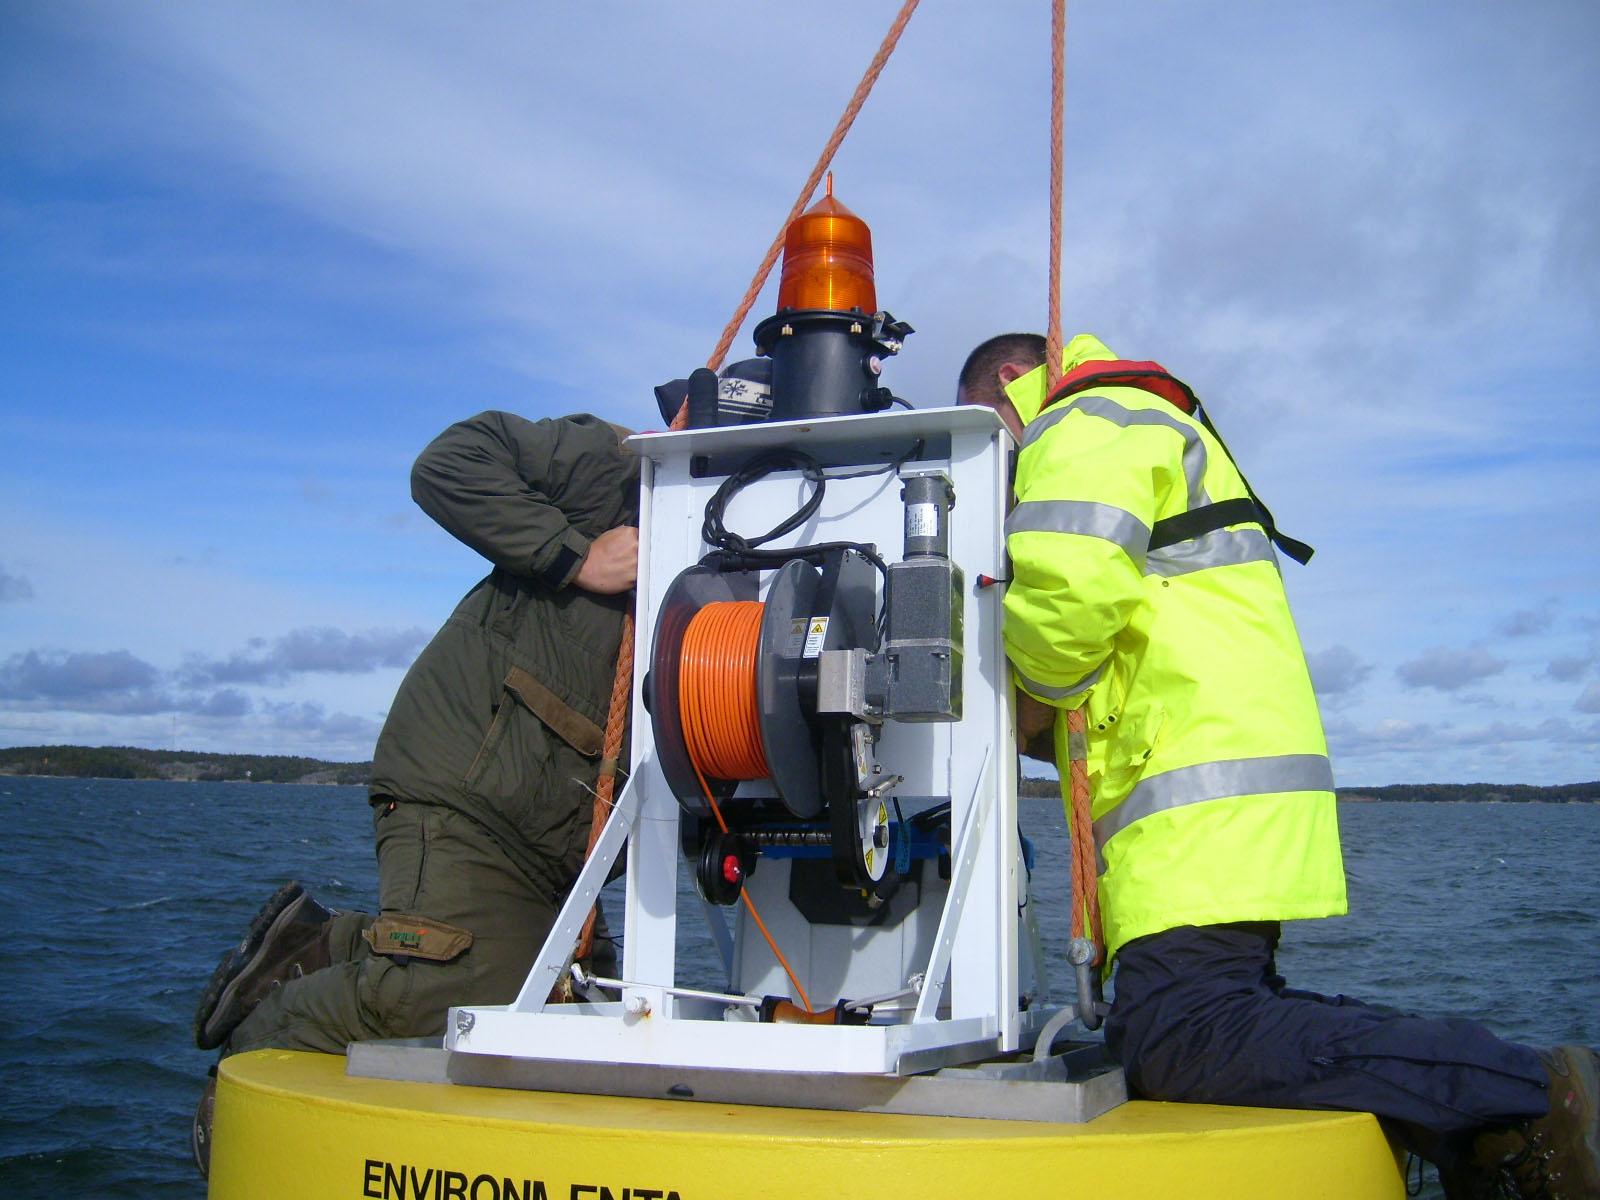 Ysi 6952 Buoy Vertical Profiling System